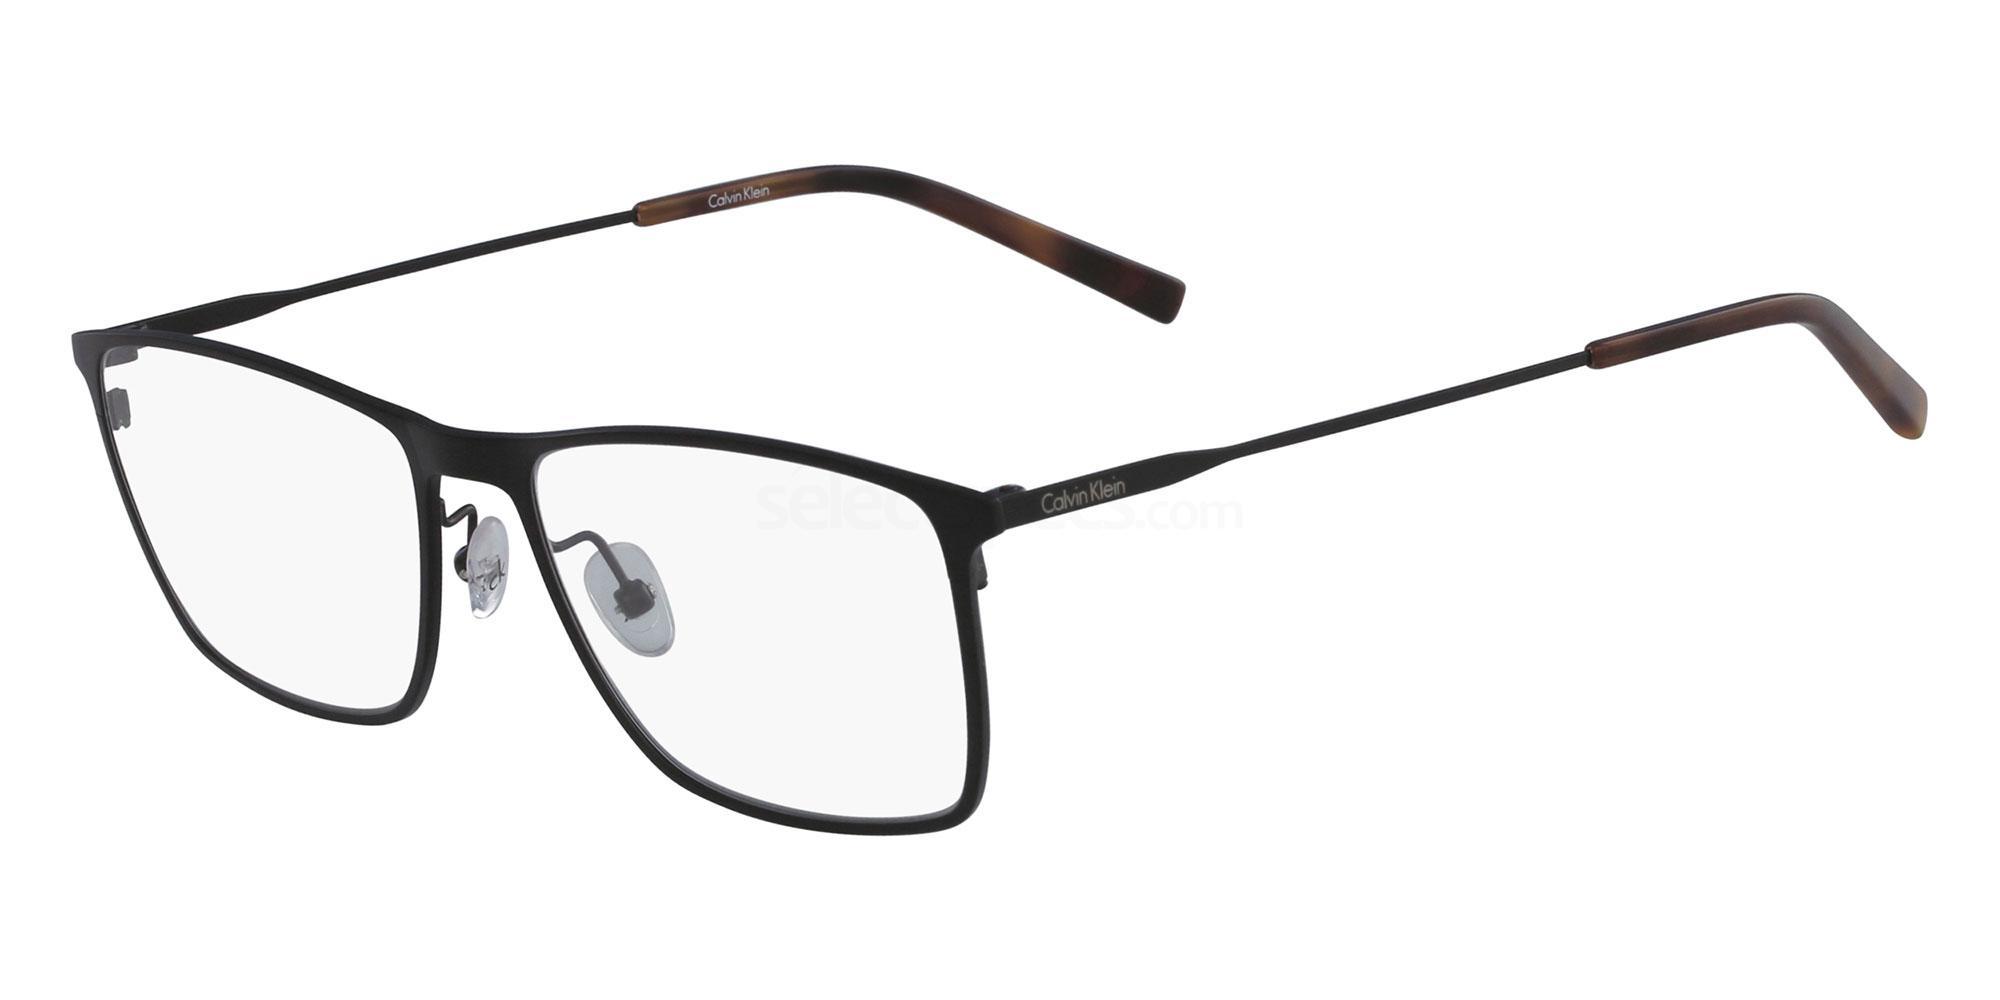 001 CK5468 Glasses, Calvin Klein